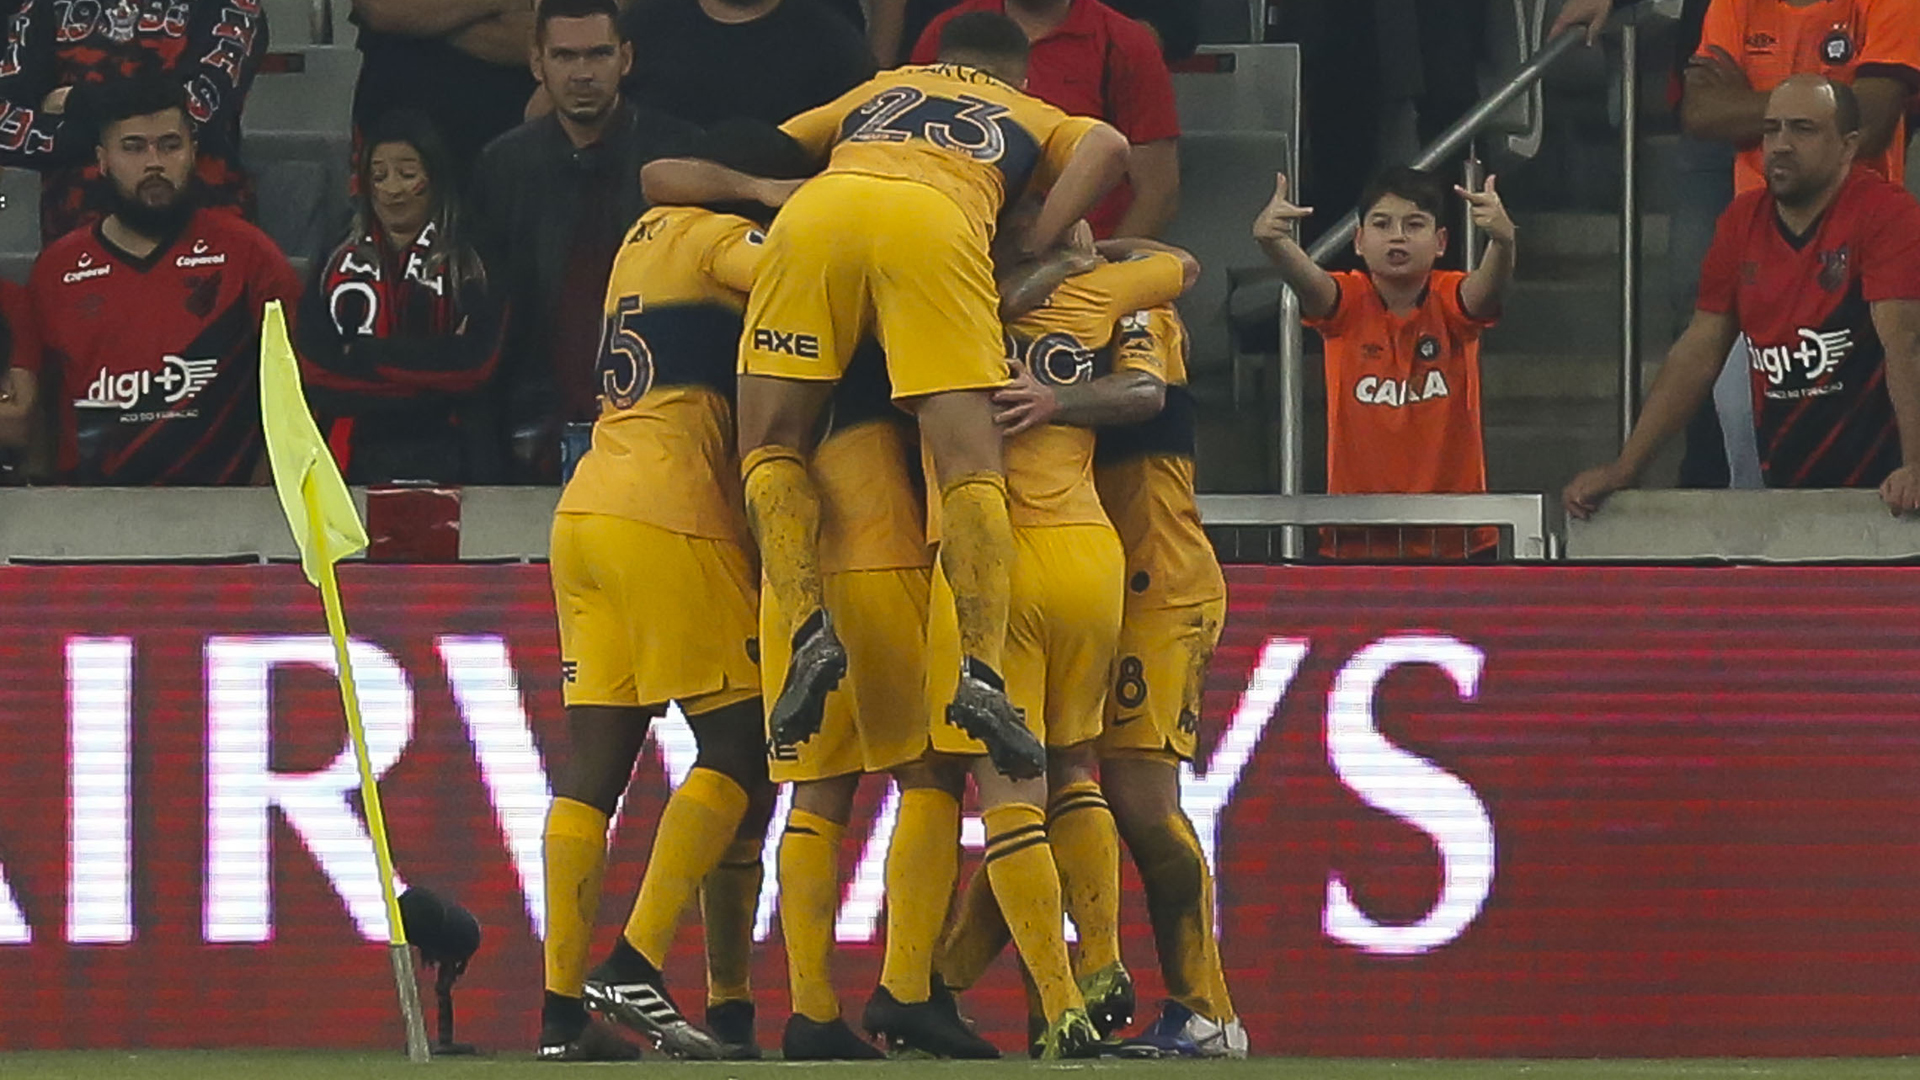 Copa Libertadores Review: Boca Juniors, Internacional claim dramatic away wins